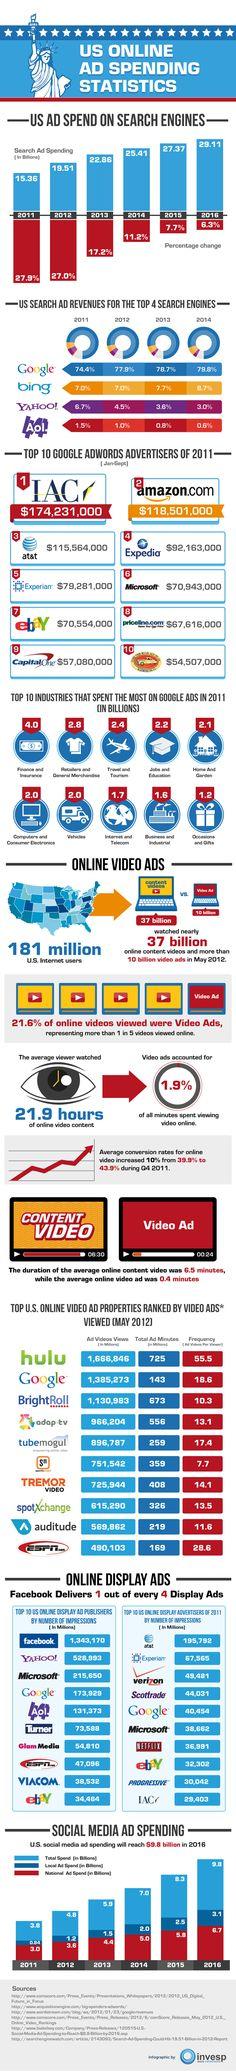 online ad spending